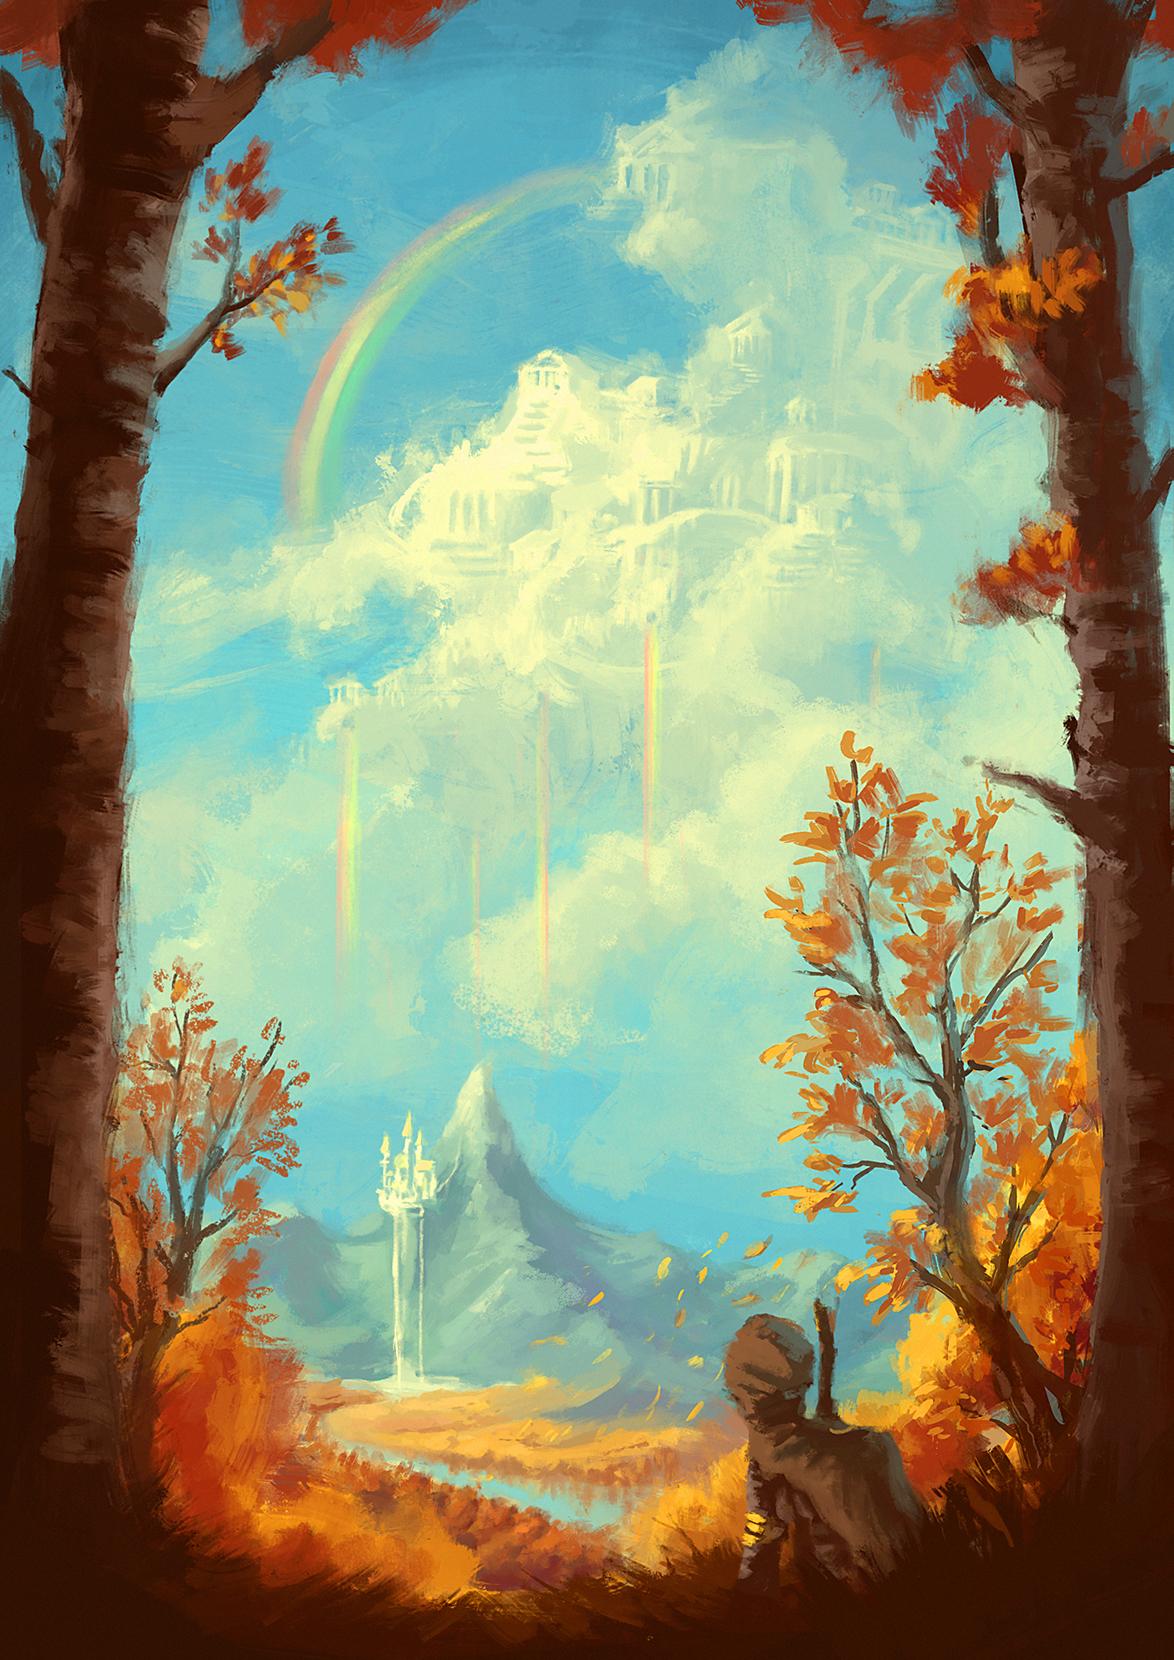 Arrival by Plainoasis